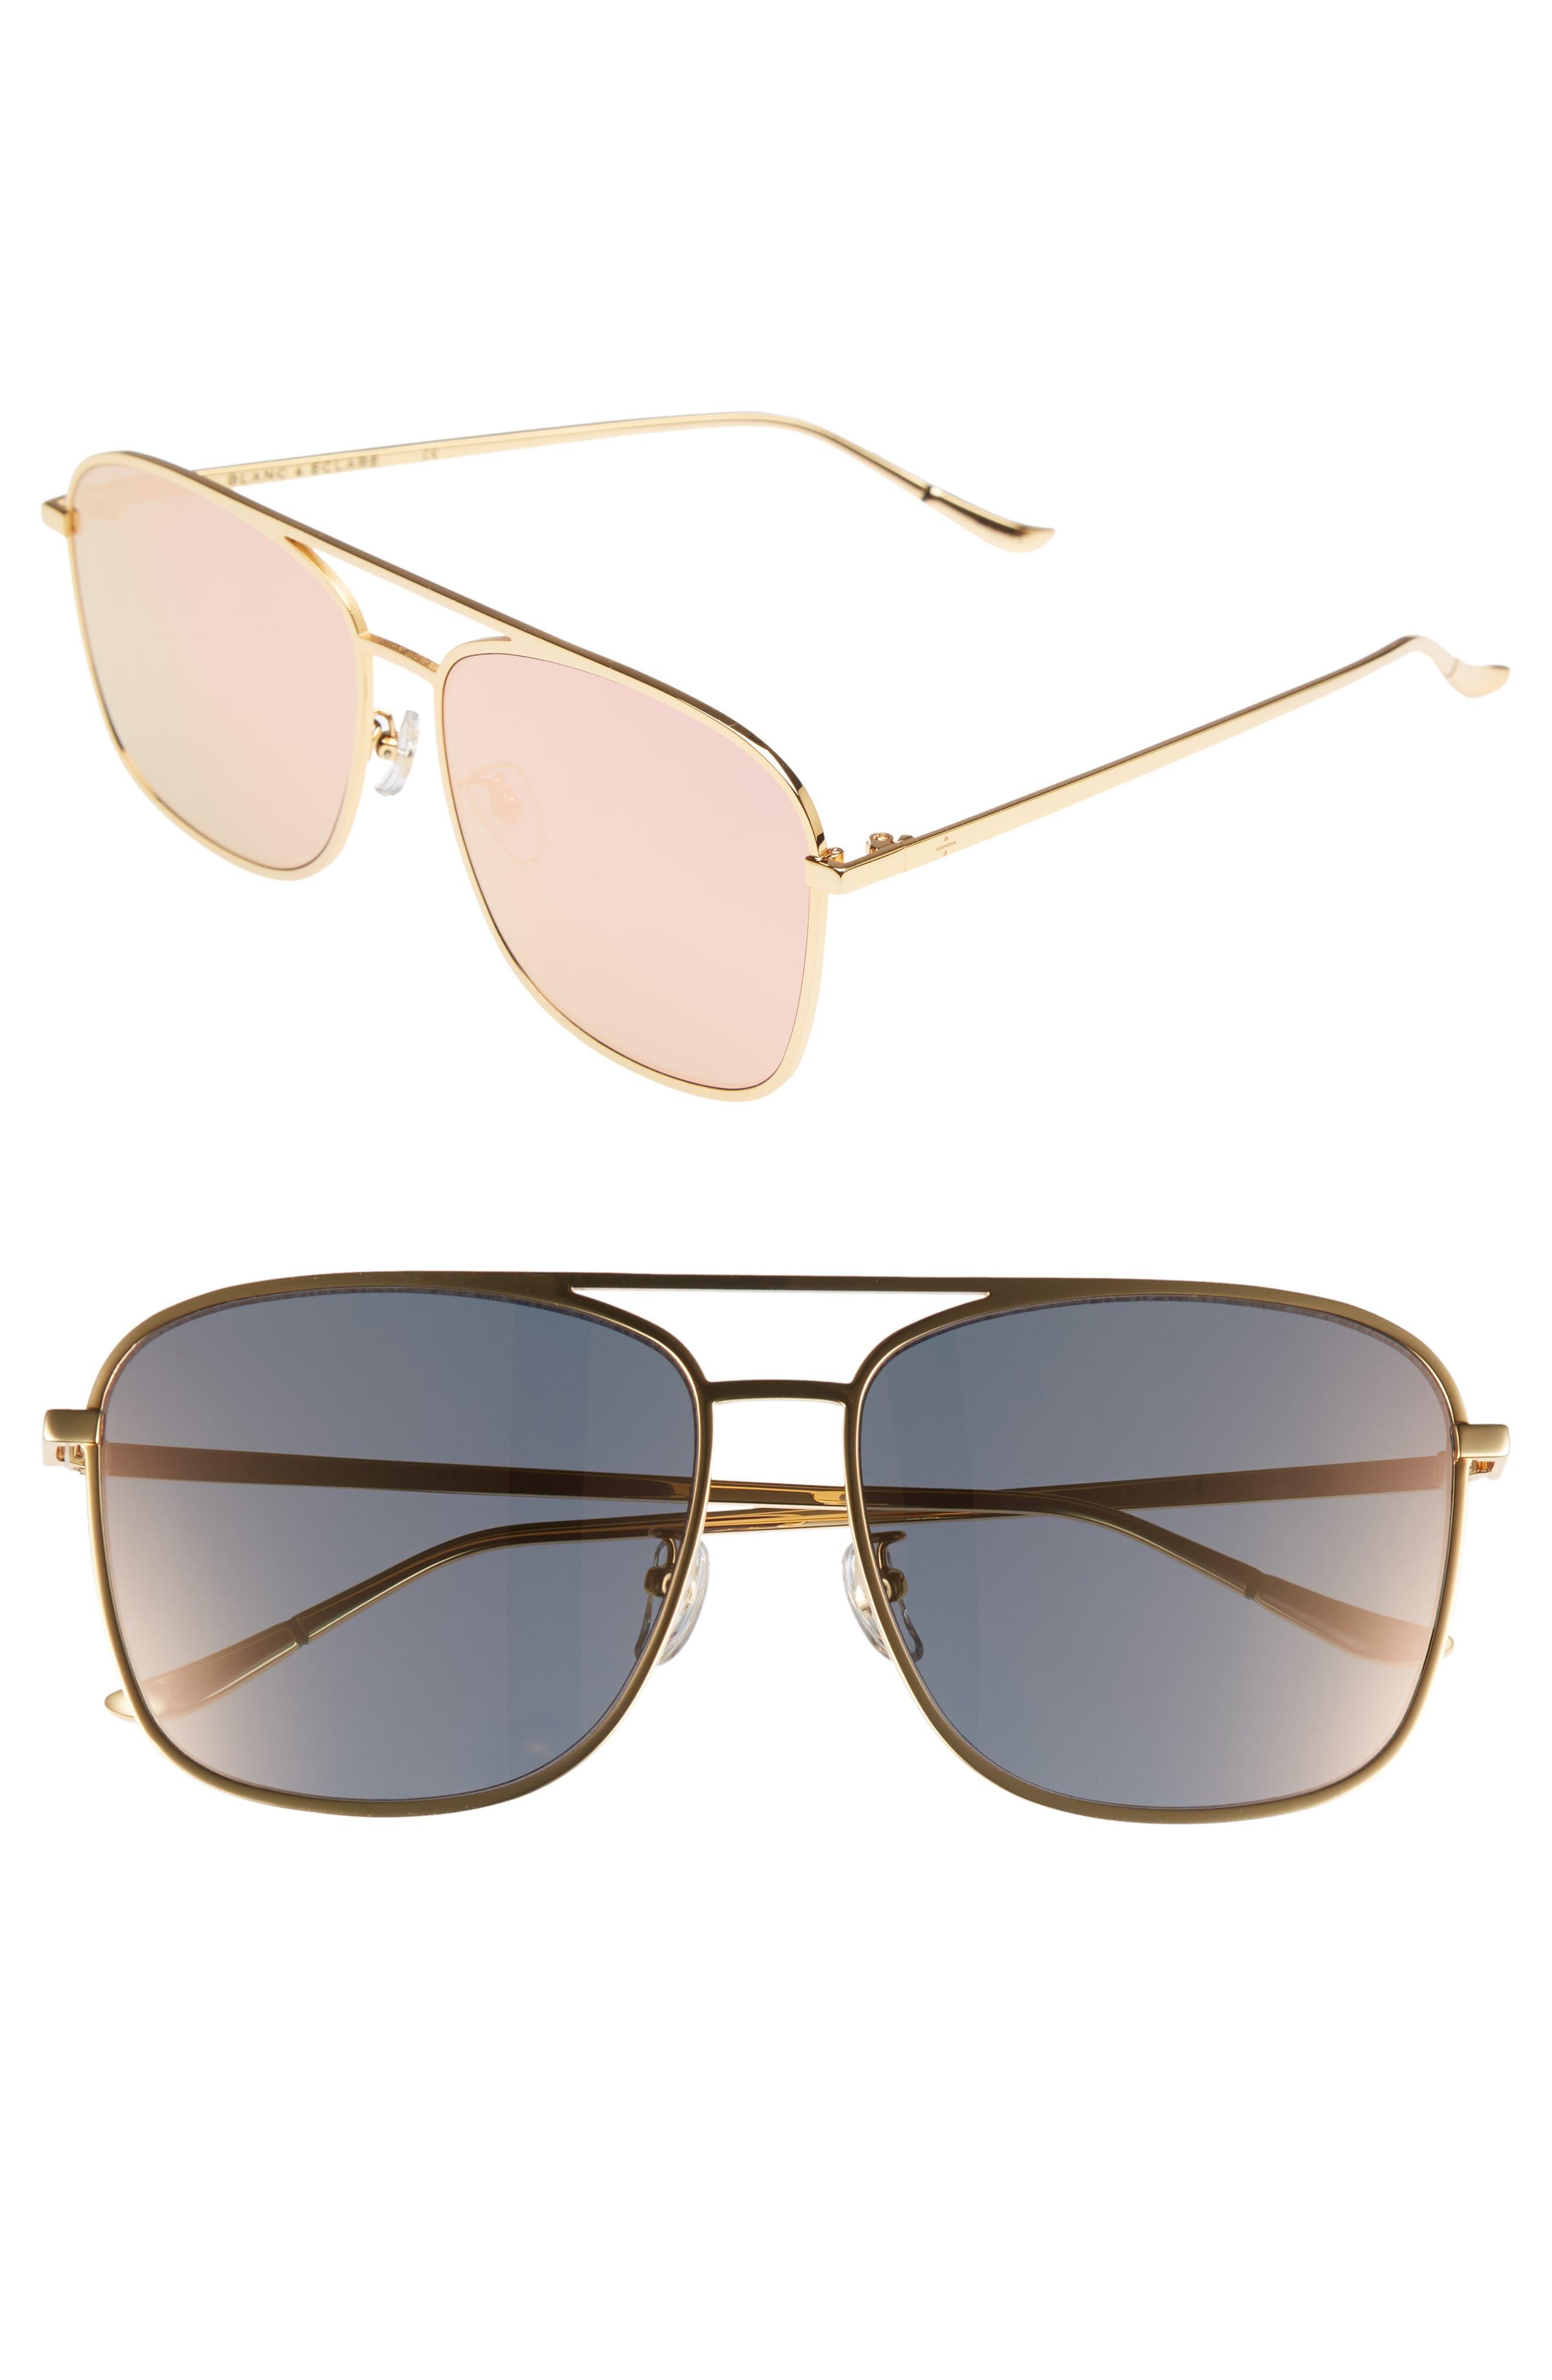 BLANC & ECLARE Geneva 61mm Large Polarized Metal Aviator Sunglasses